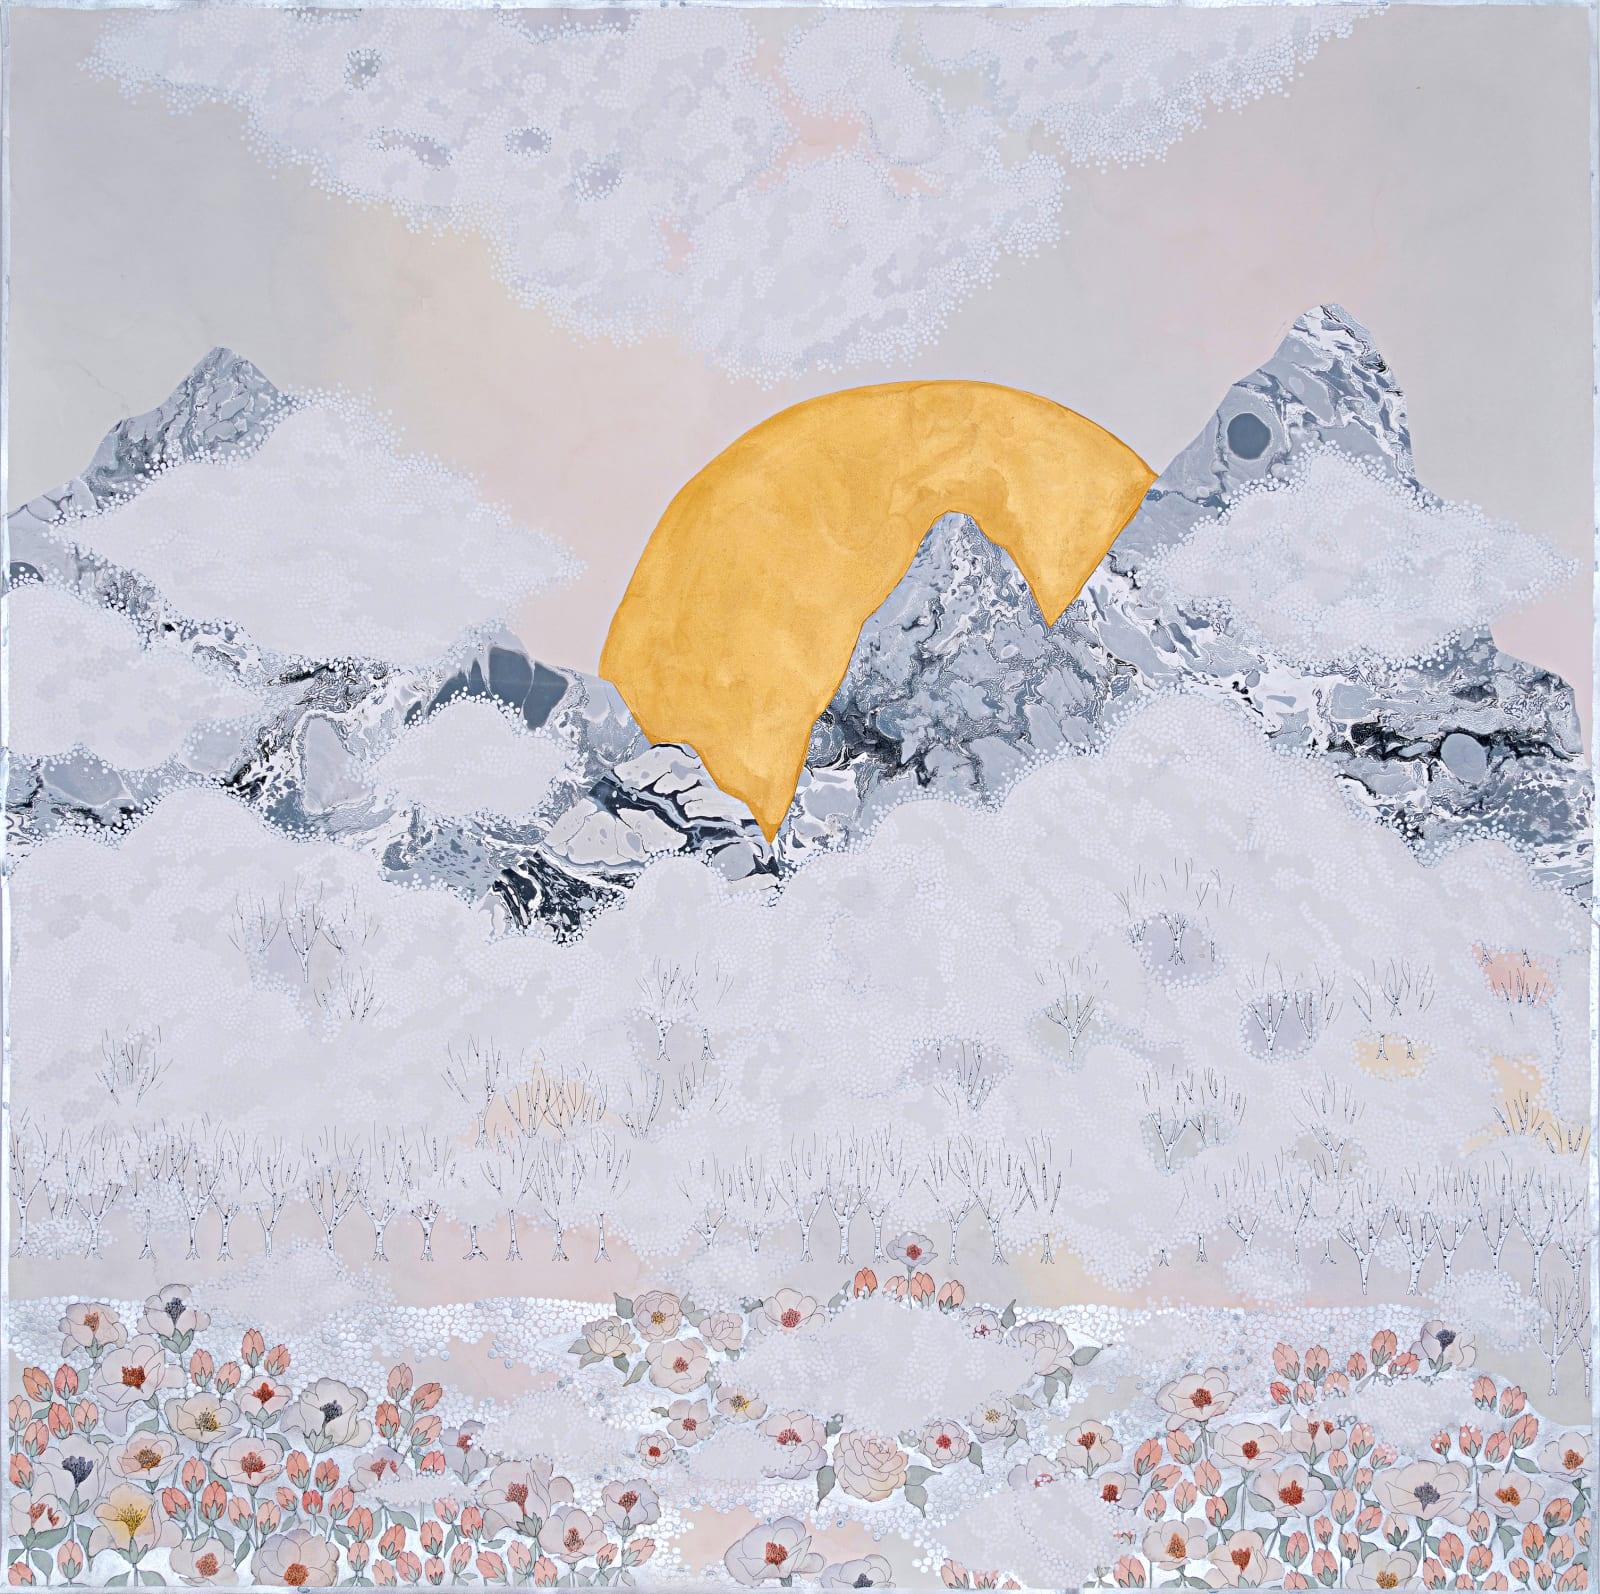 Crystal Liu, the fog, 'rise up', 2019